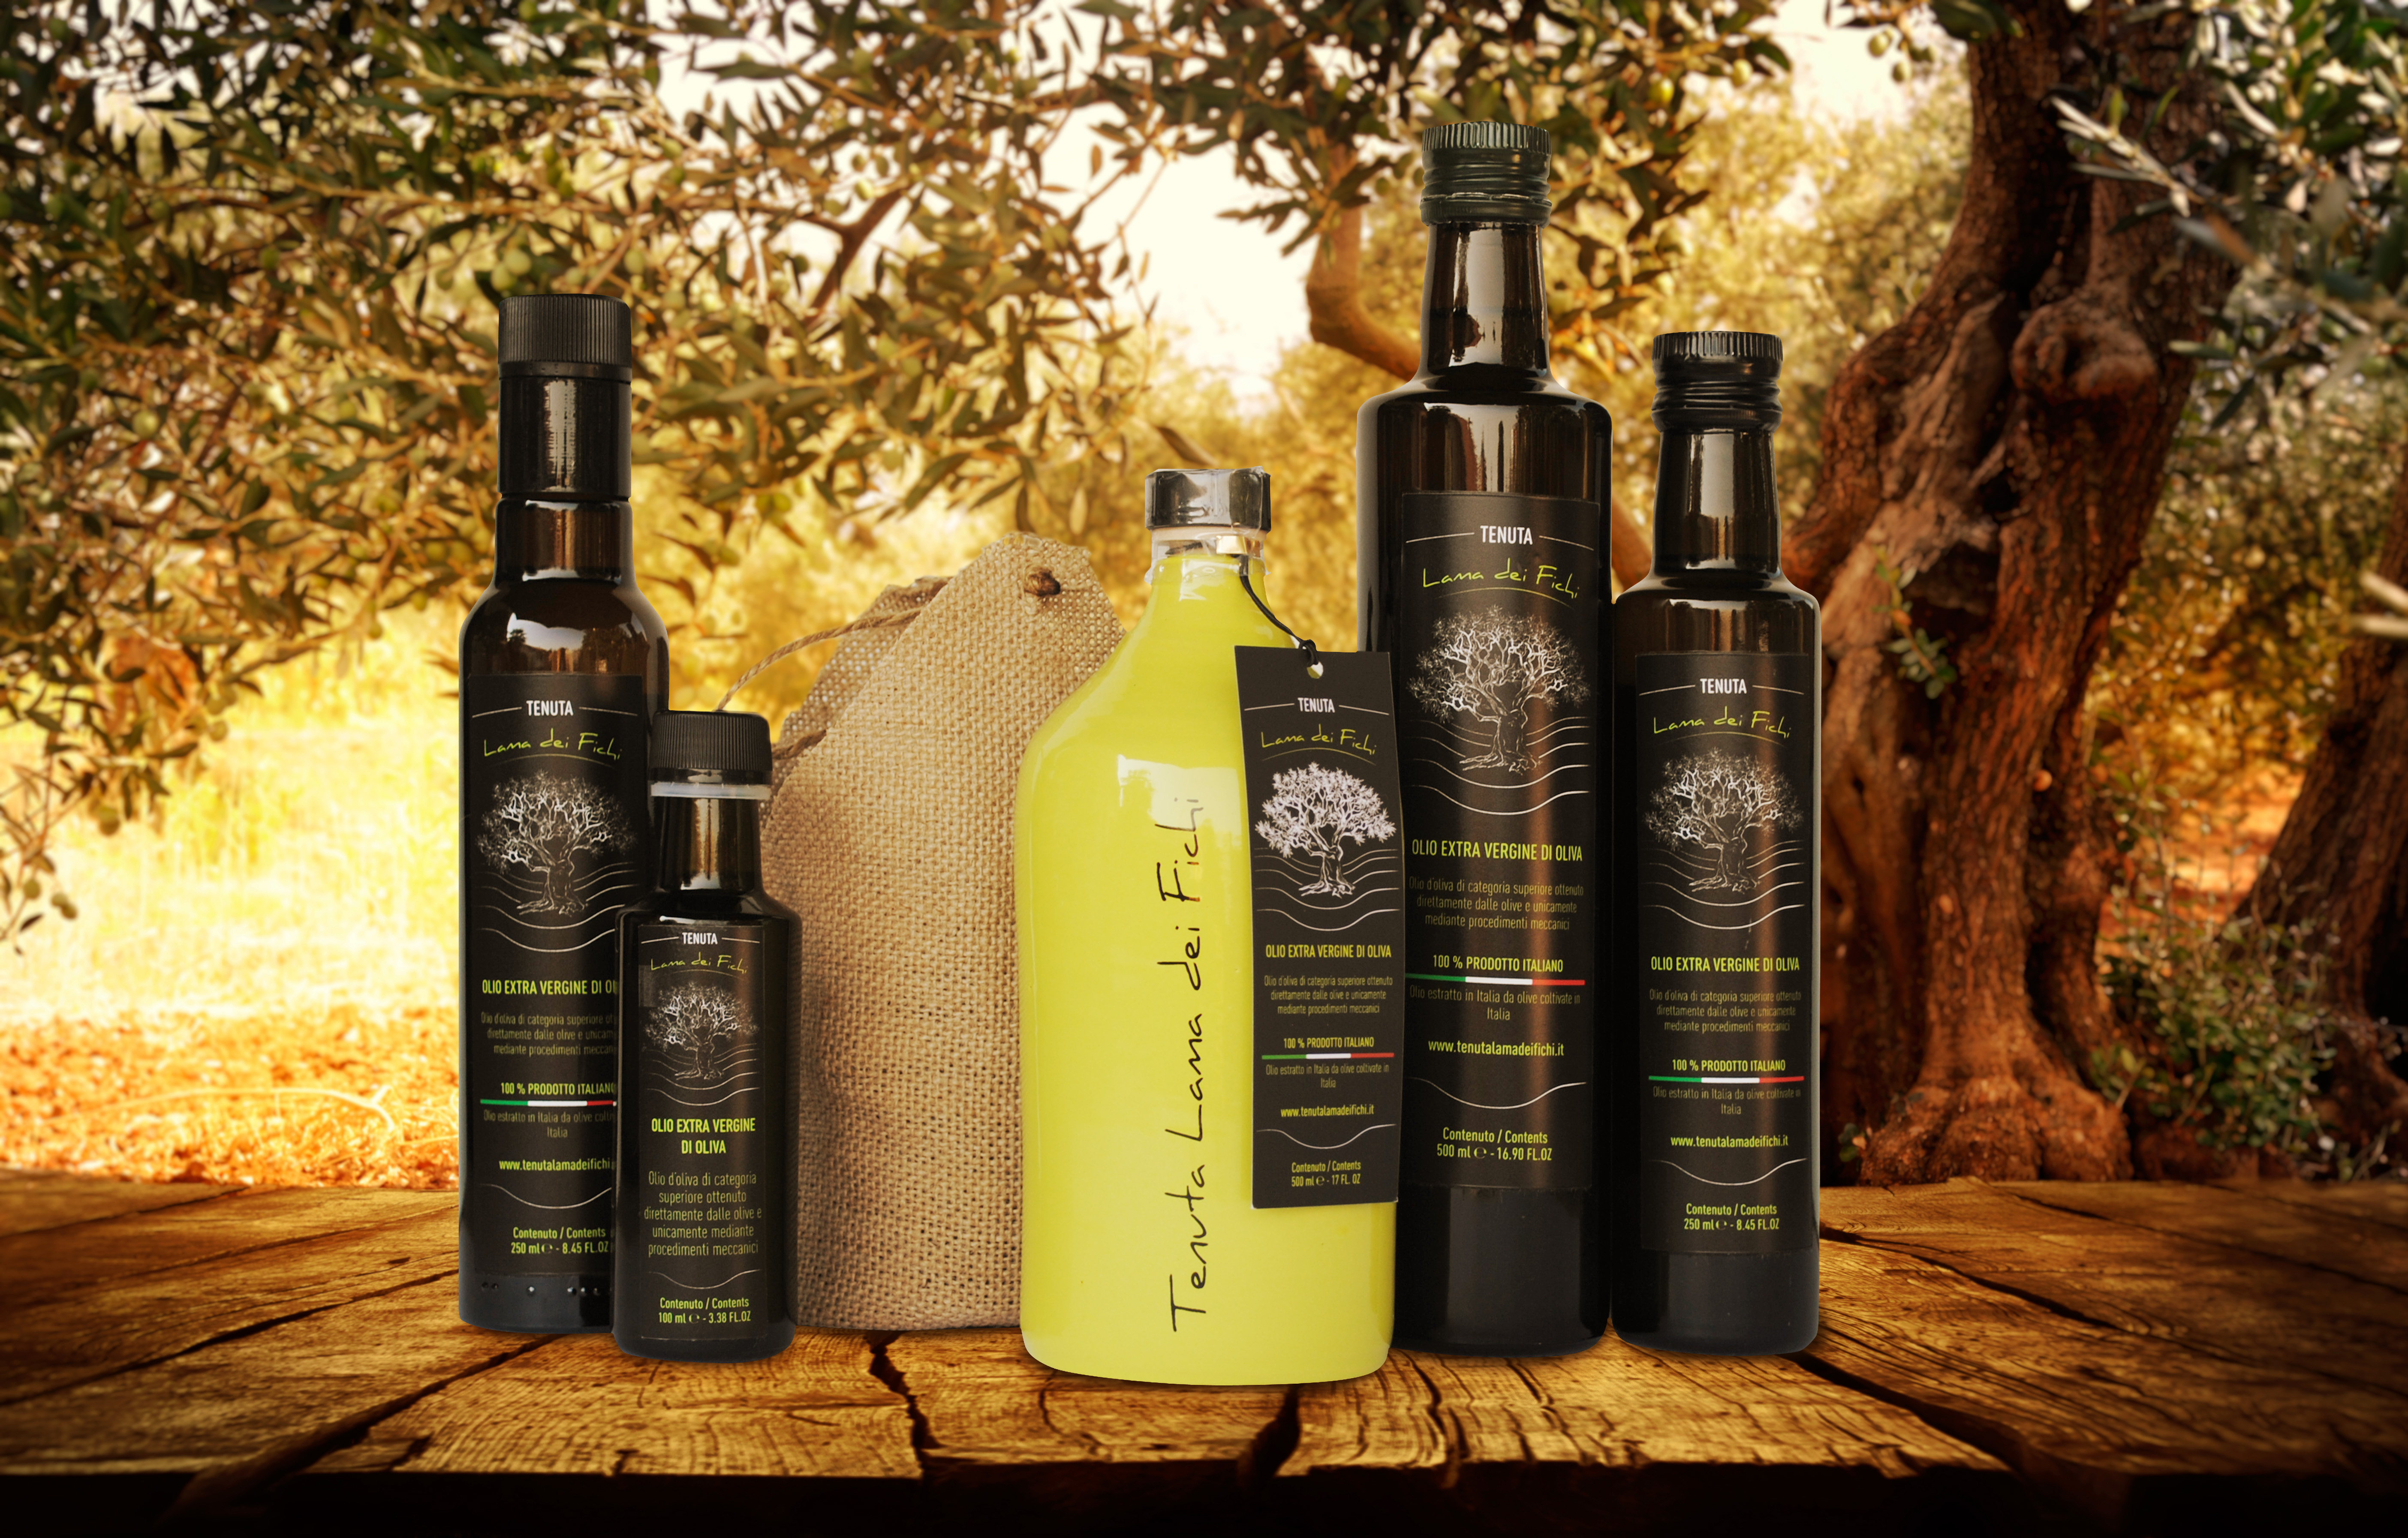 Tenuta Lama dei Fichi / products set